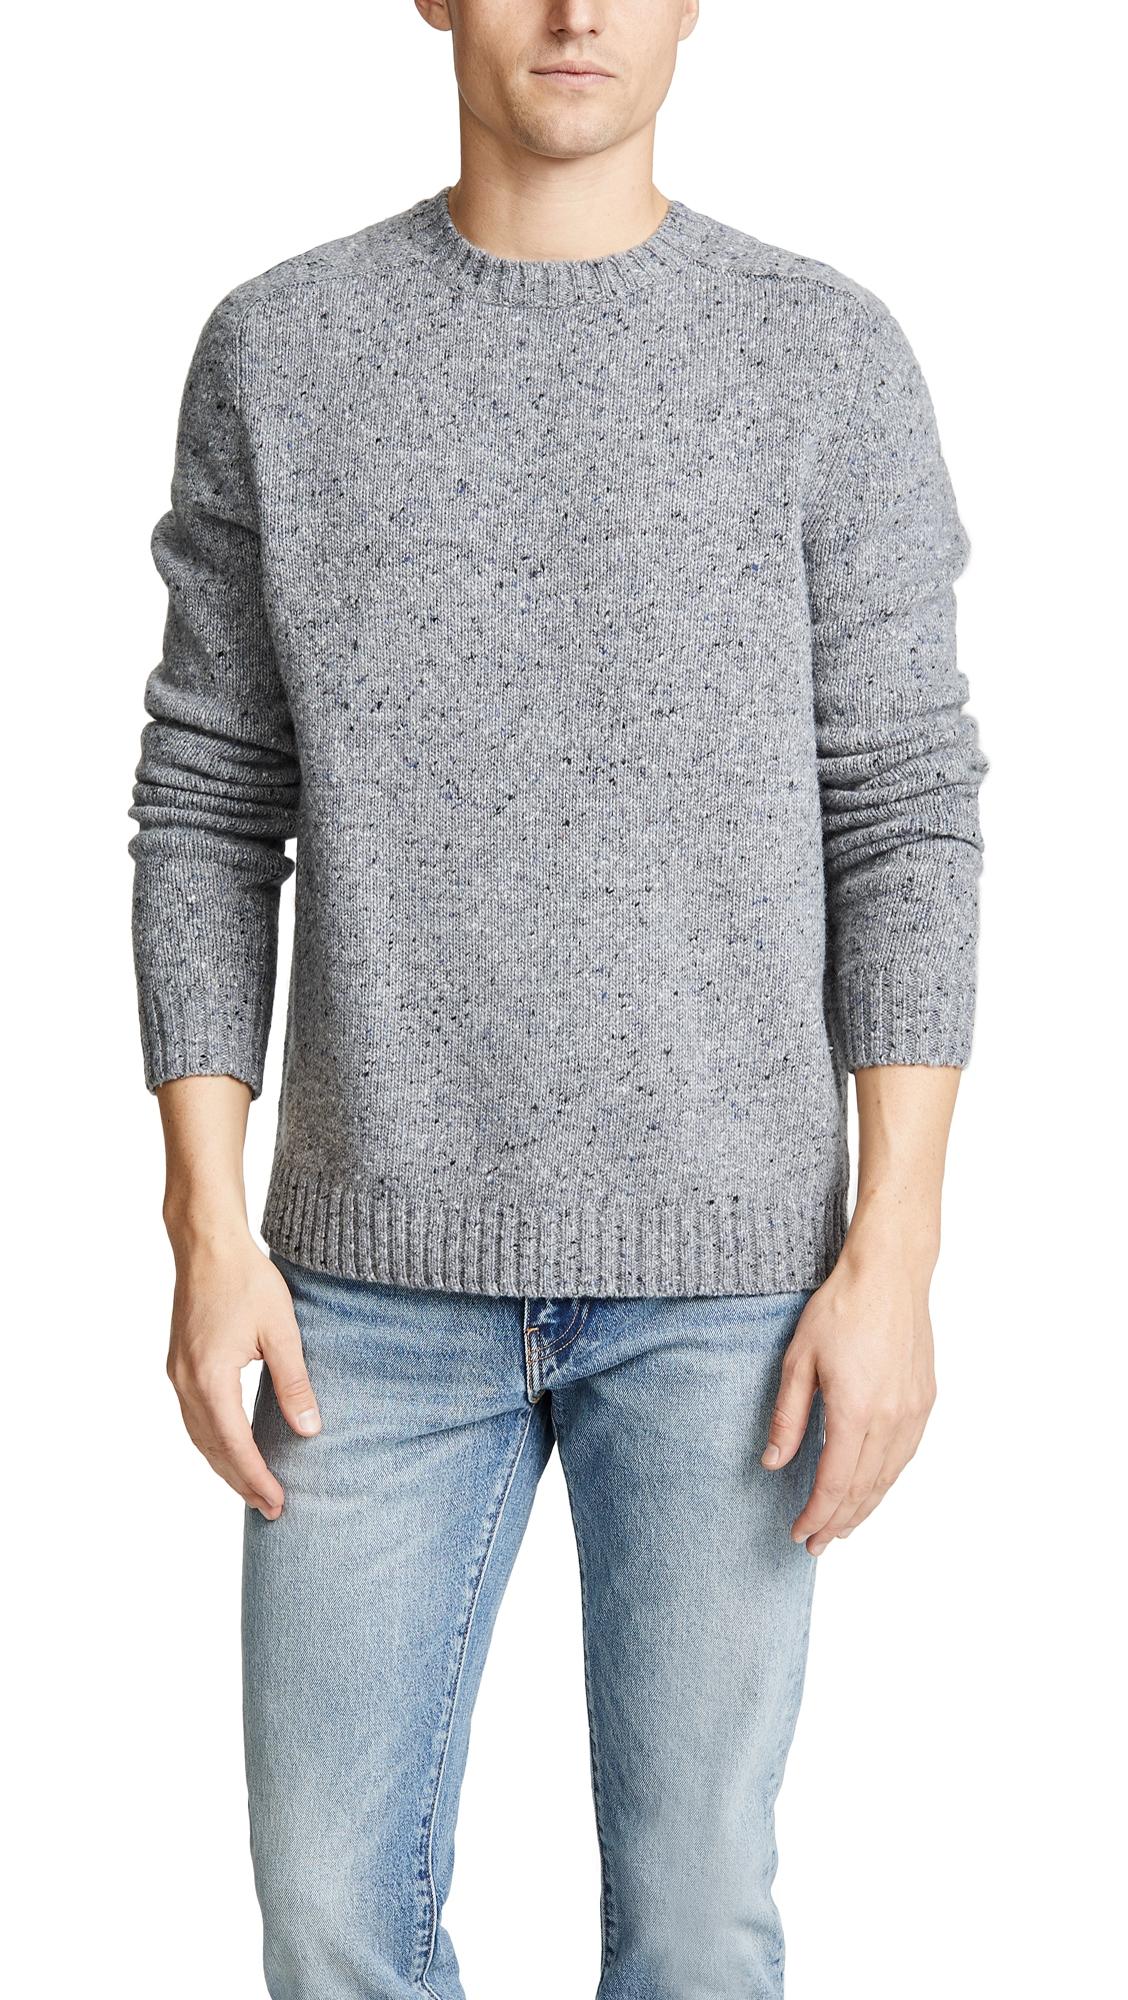 MOLLUSK Cambridge Sweater in Mull